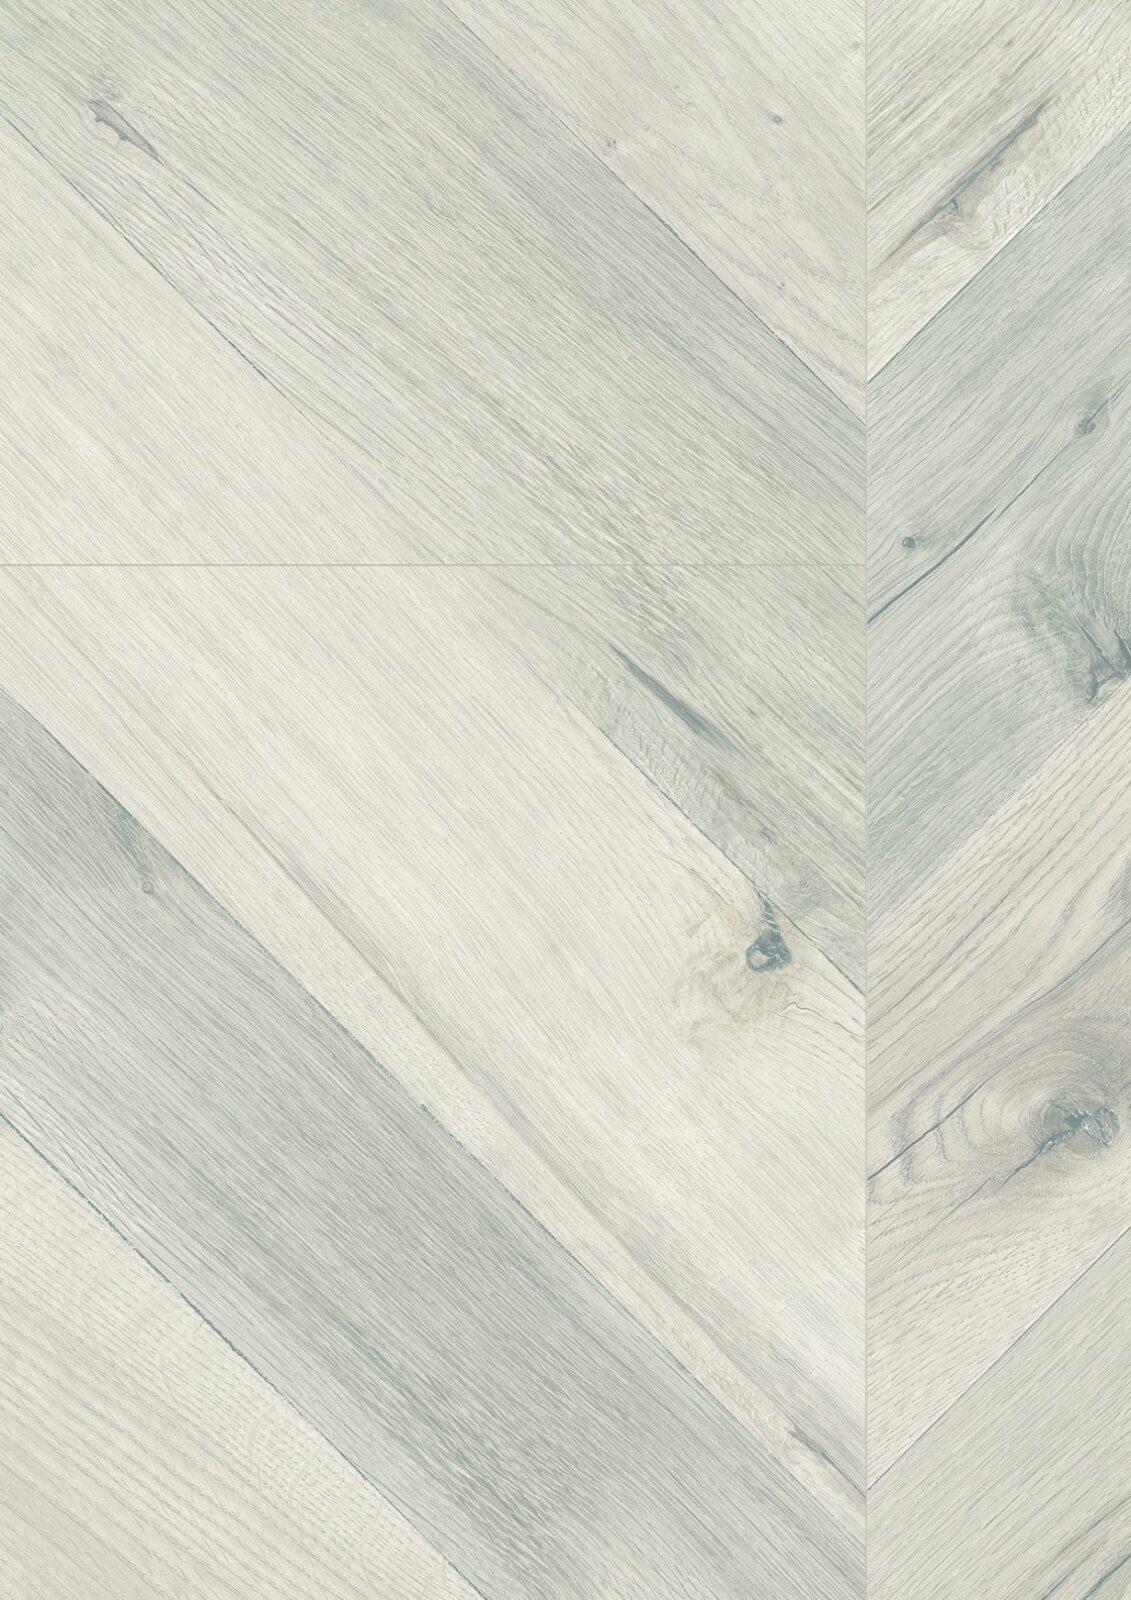 Tarima flotante roble blanco espiga a9344 pavimento laminado - Tarima roble blanco ...